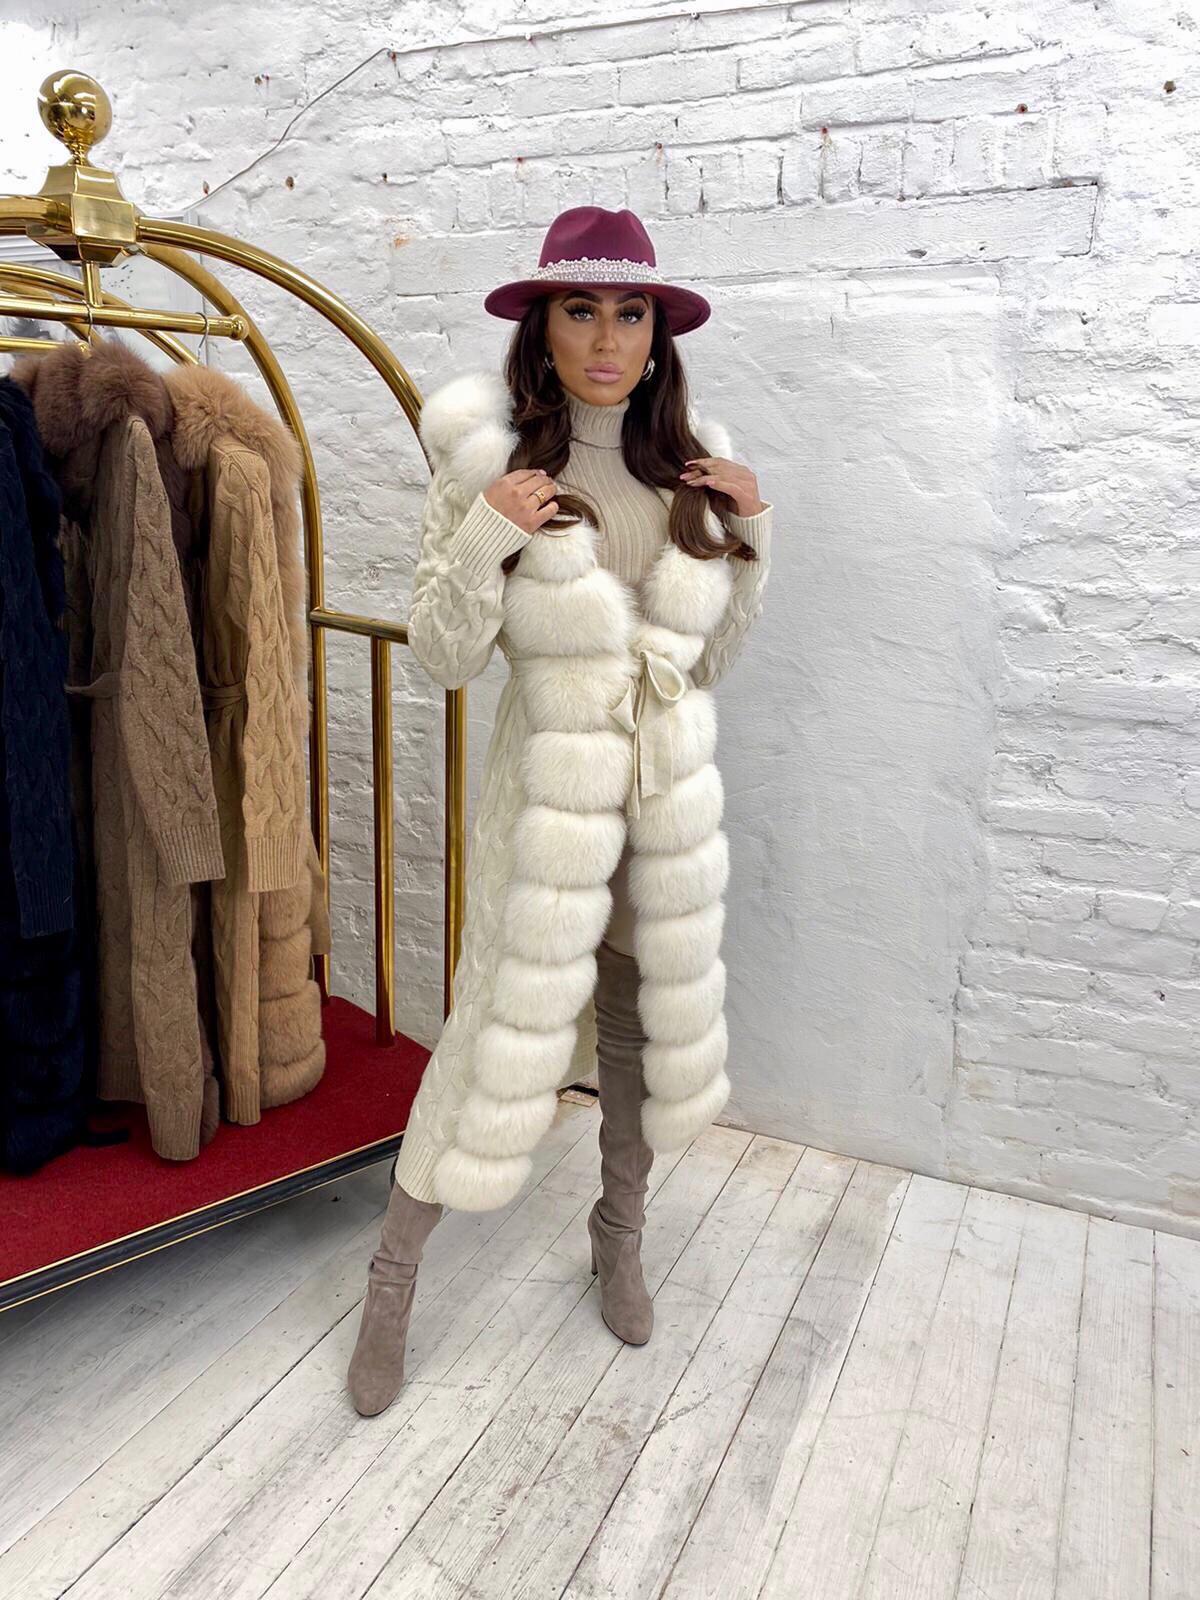 Courtney Smith Luxury Ecrue wool cardigan with ecrue fox fur